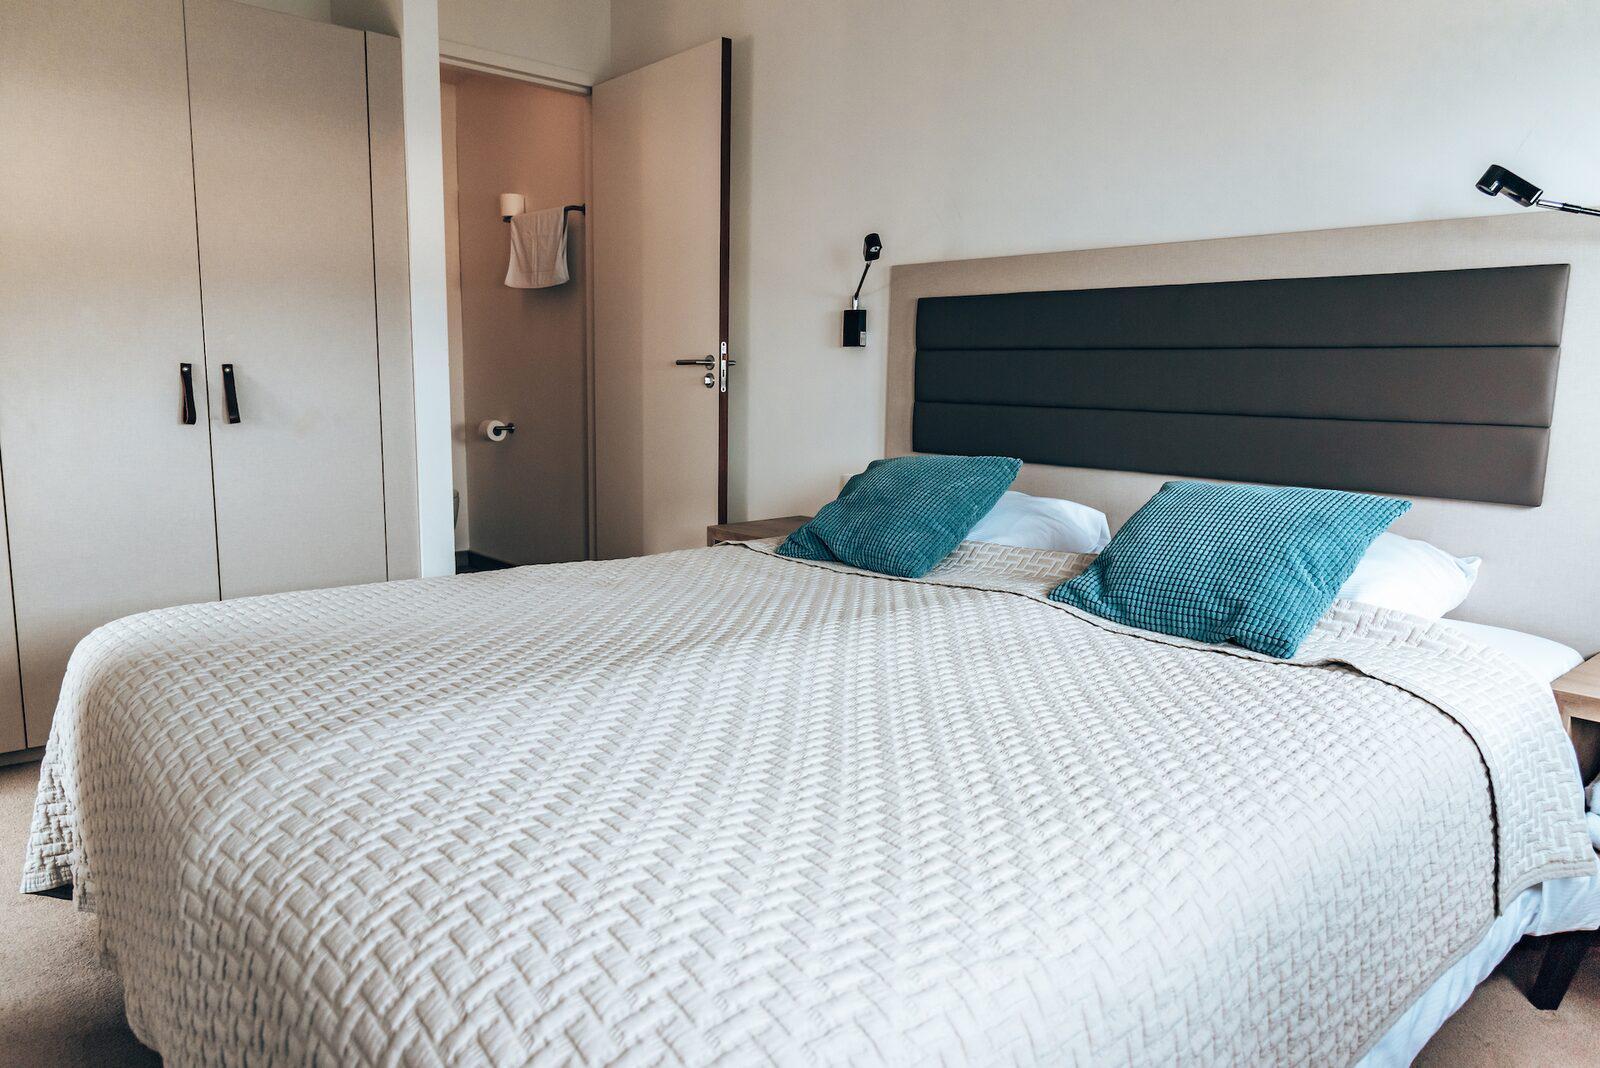 Oasis Parcs Hotelstudio 4 personen Ouddorp Zuid-Holland